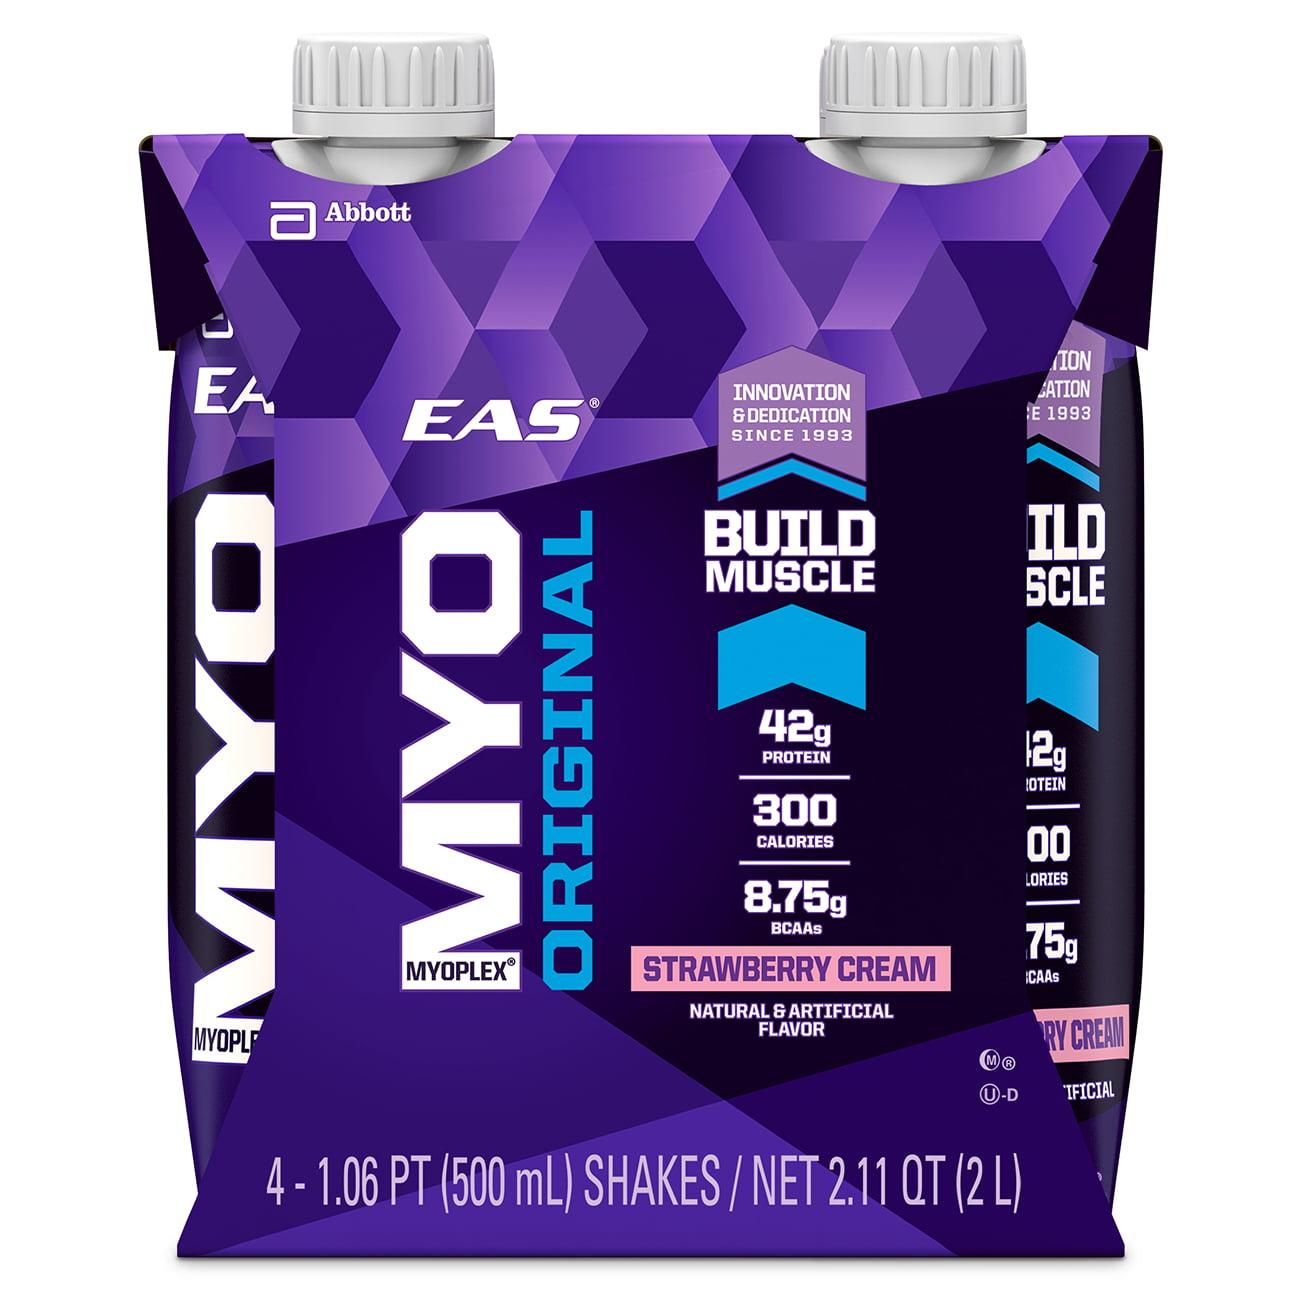 EAS Myoplex Original Ready-to-Drink Nutrition Shake, Strawberry Cream, 500 mL, (3-4 Packs)